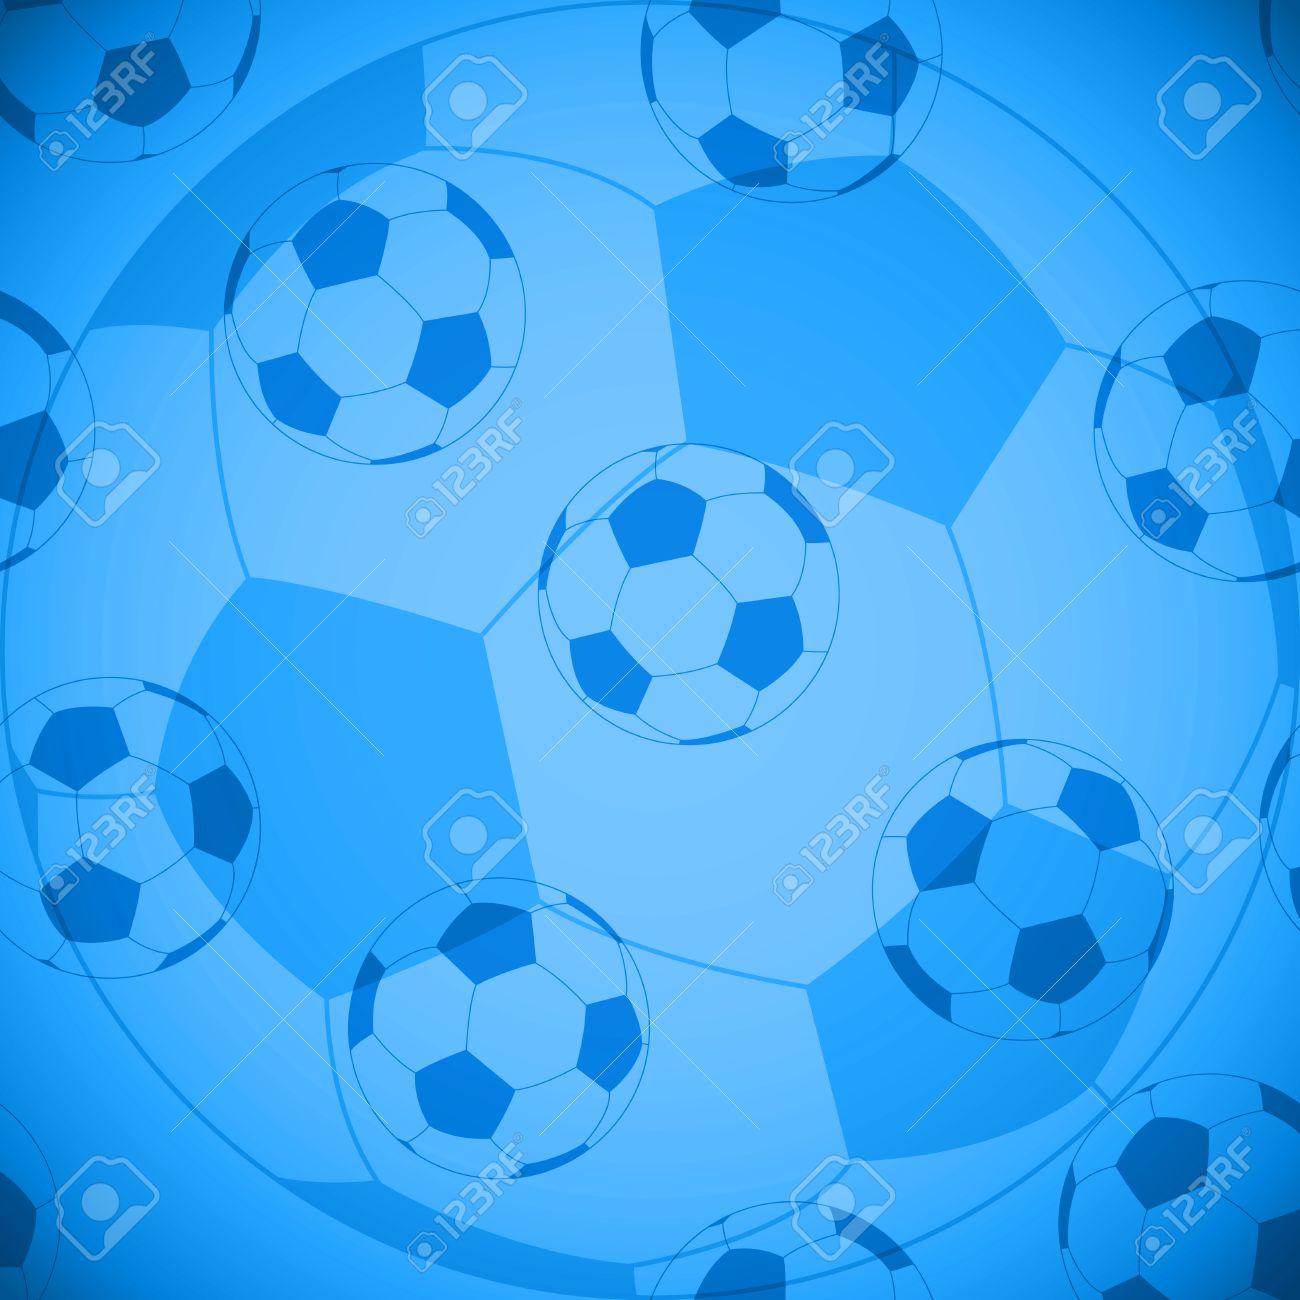 Vettoriale Carta Da Parati Di Calcio Sfondo Blu Senza Soluzione